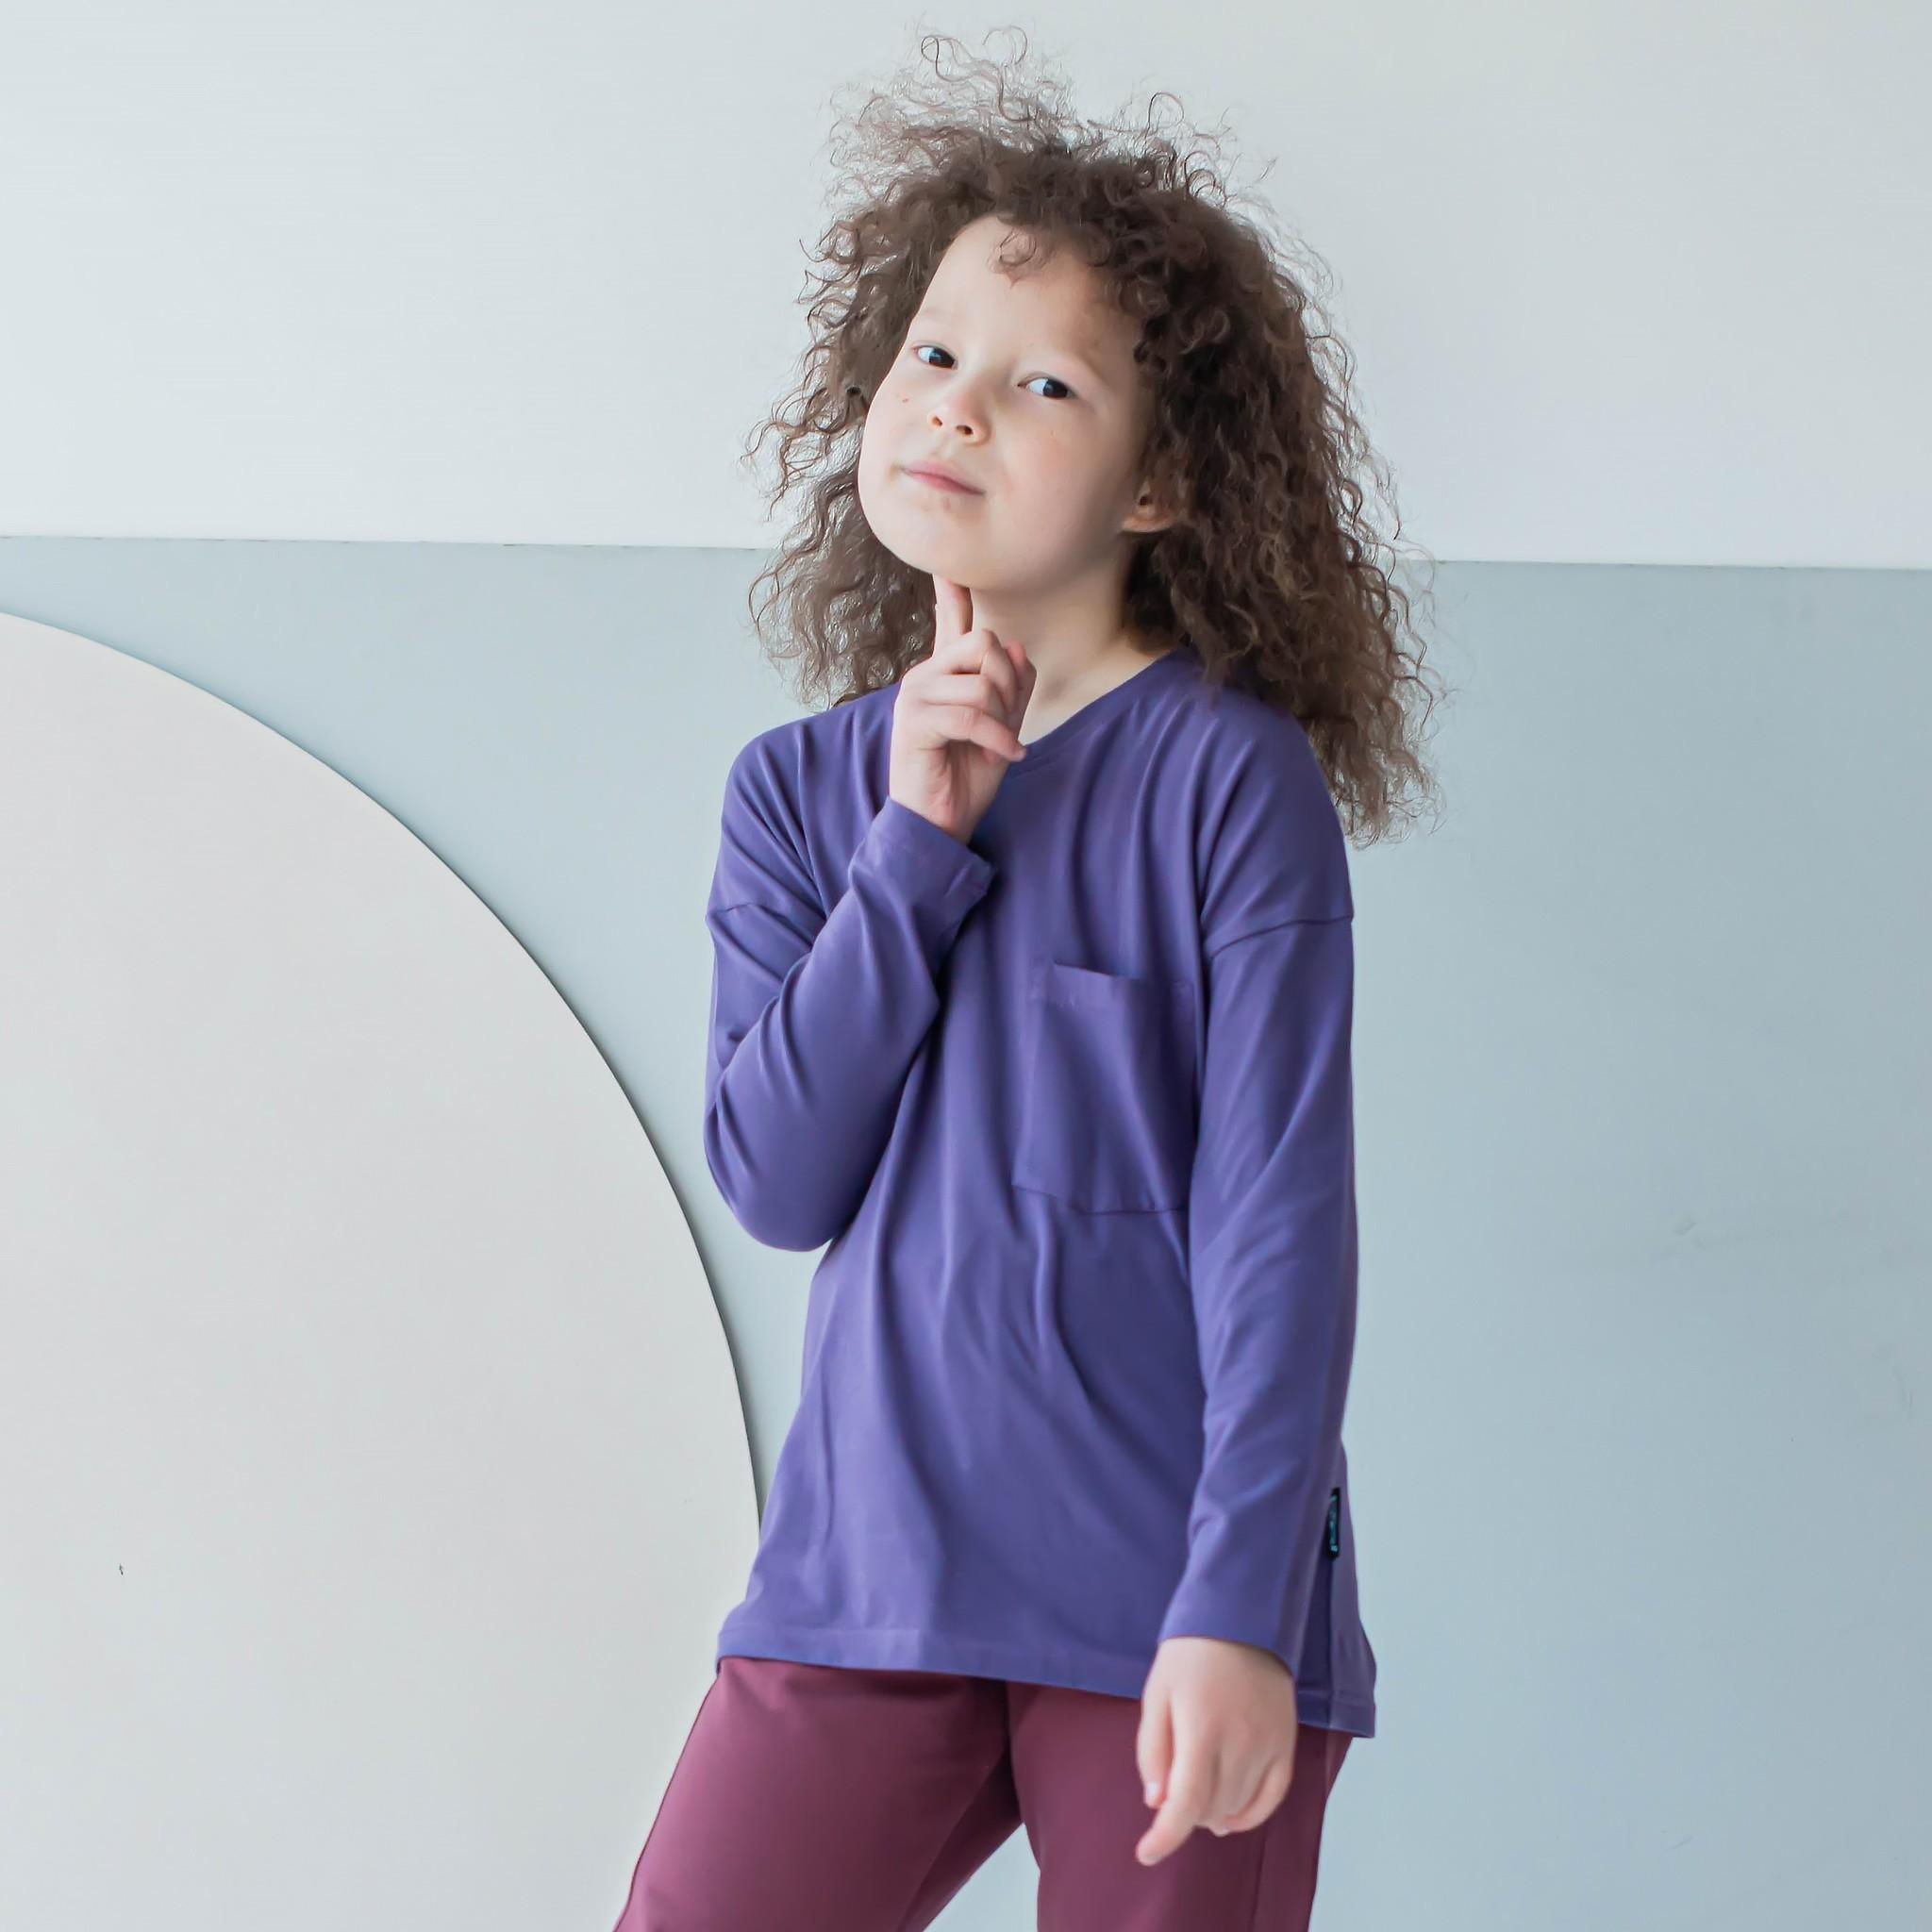 Long-sleeved T-shirt for teens - Grape